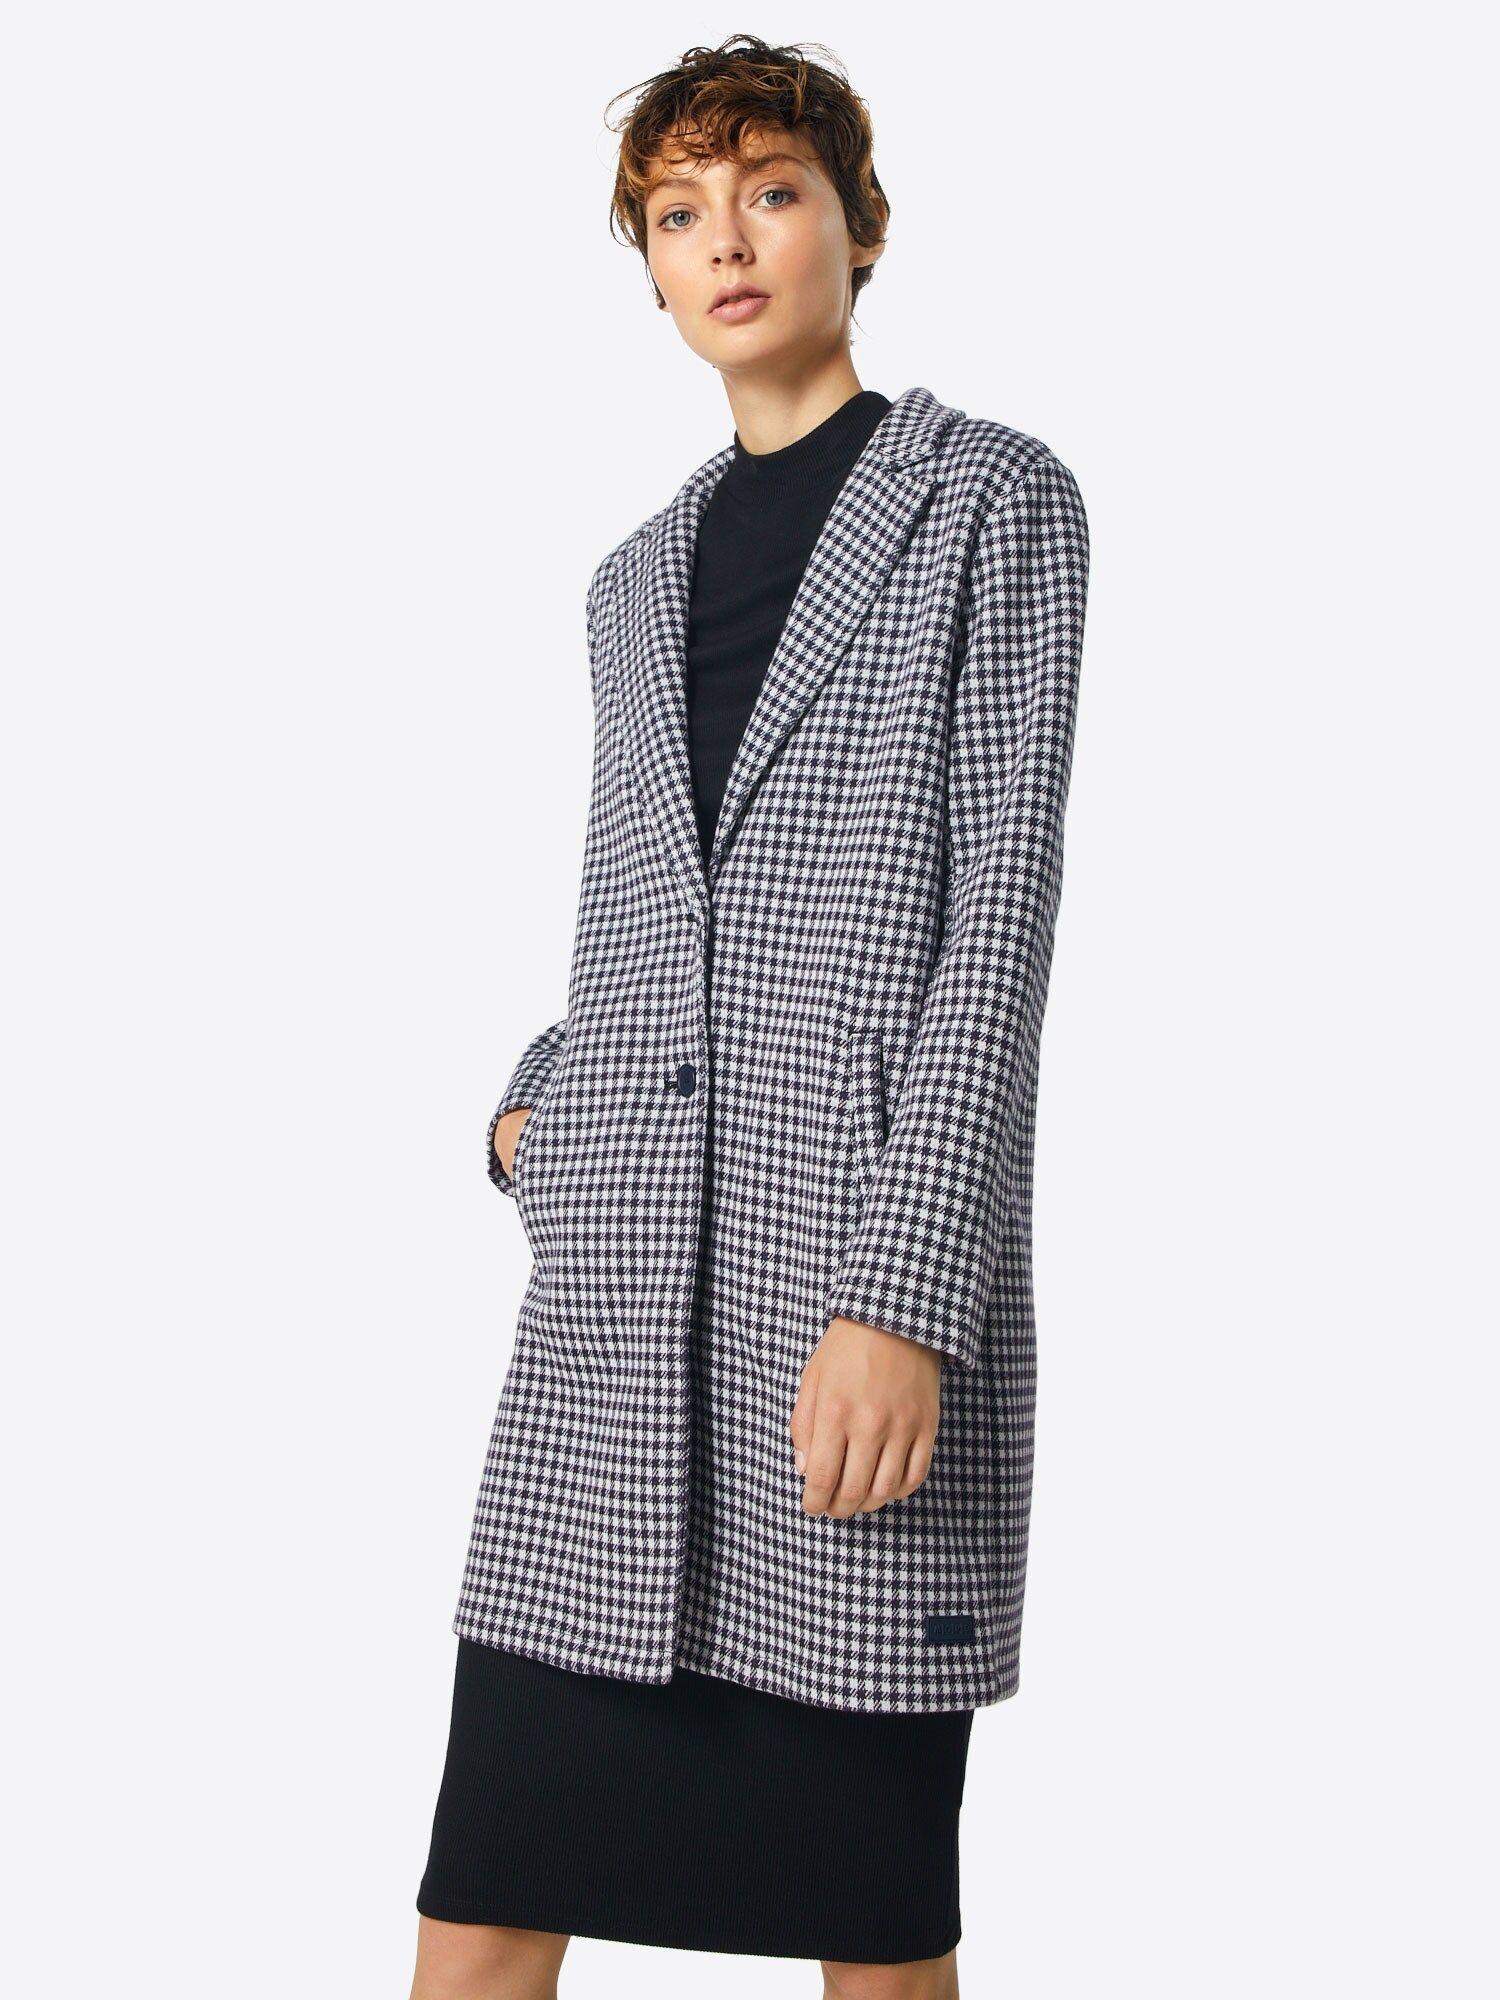 Marc O Polo Denim Mantel Damen Schwarz Weiss Grosse Xl In 2020 Denim Mantel Mantel Damen Mantel